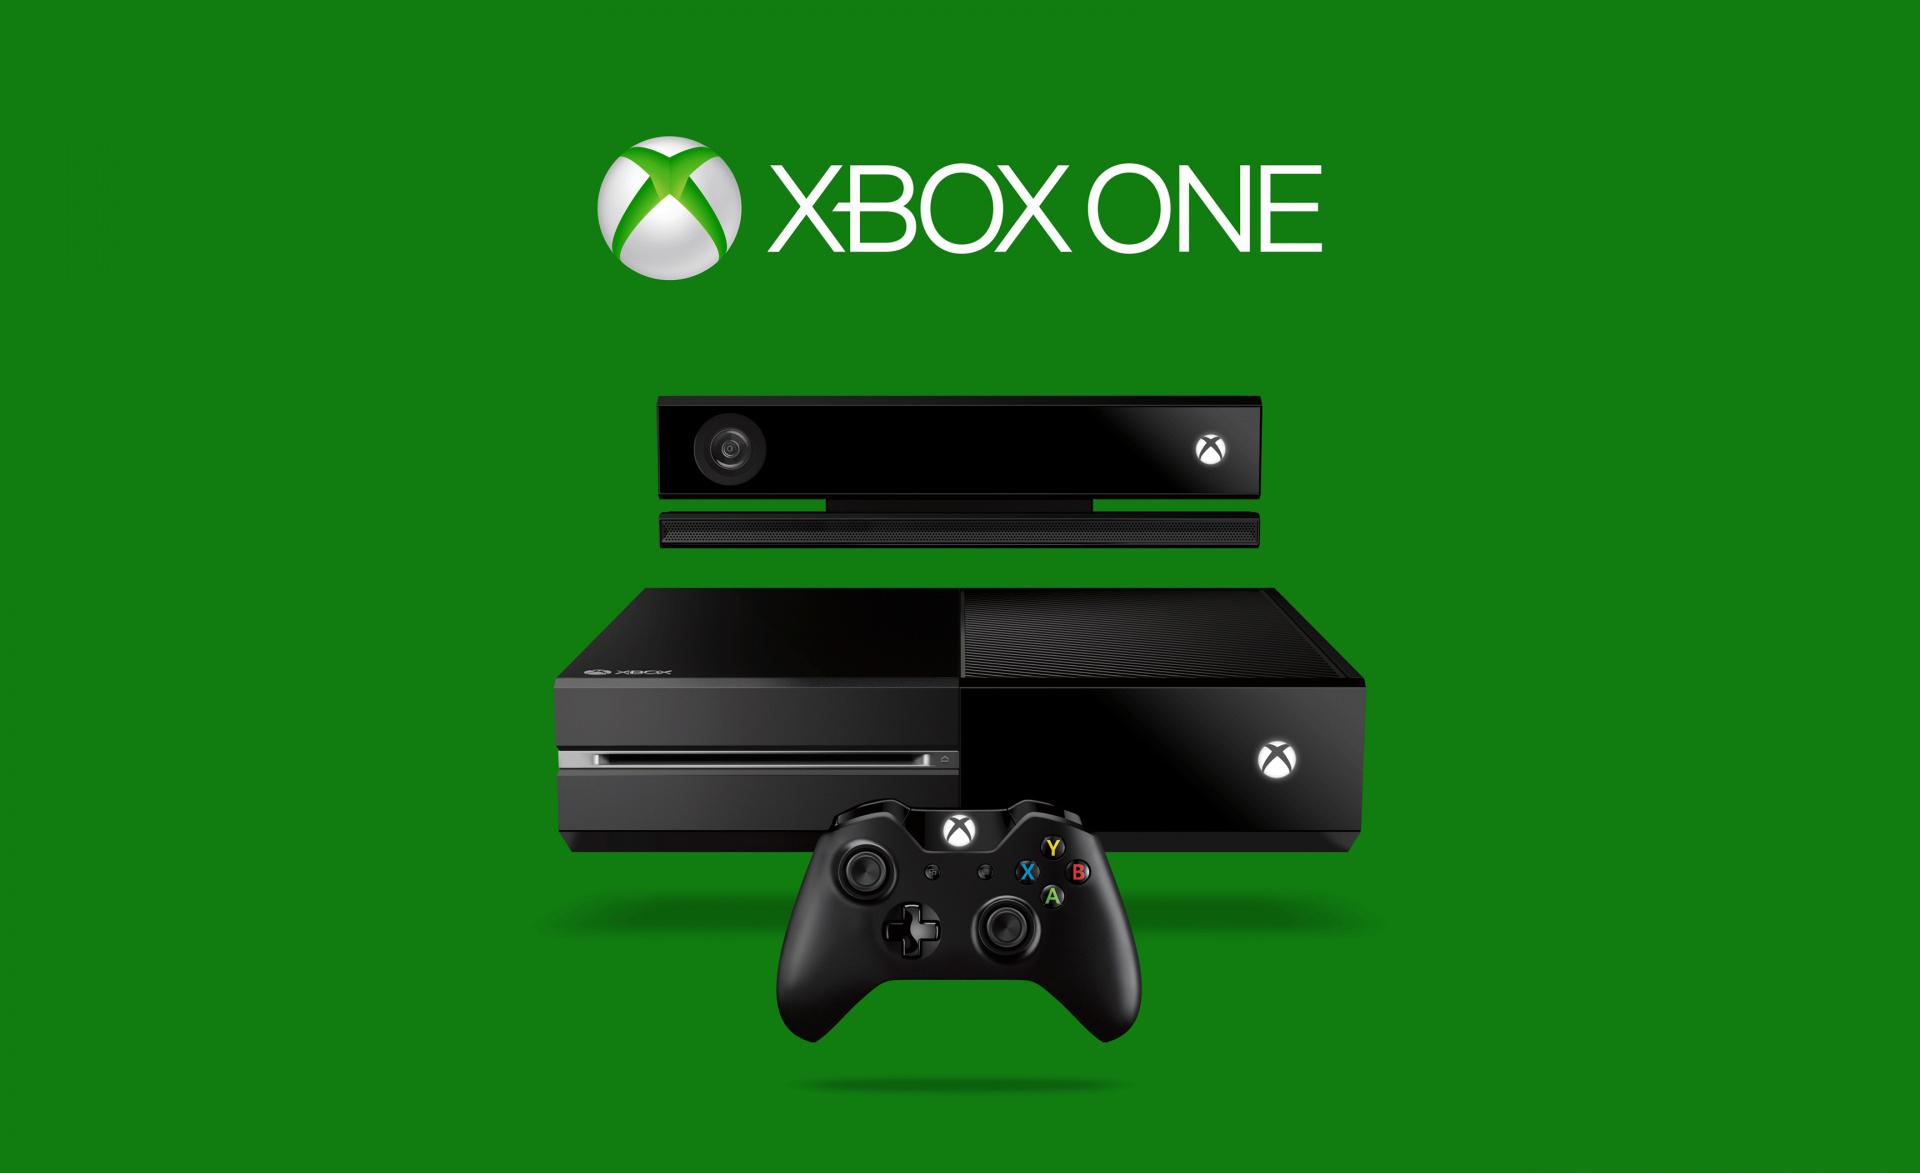 Spring 3d Live Wallpaper Xbox One Backgrounds Free Download Pixelstalk Net